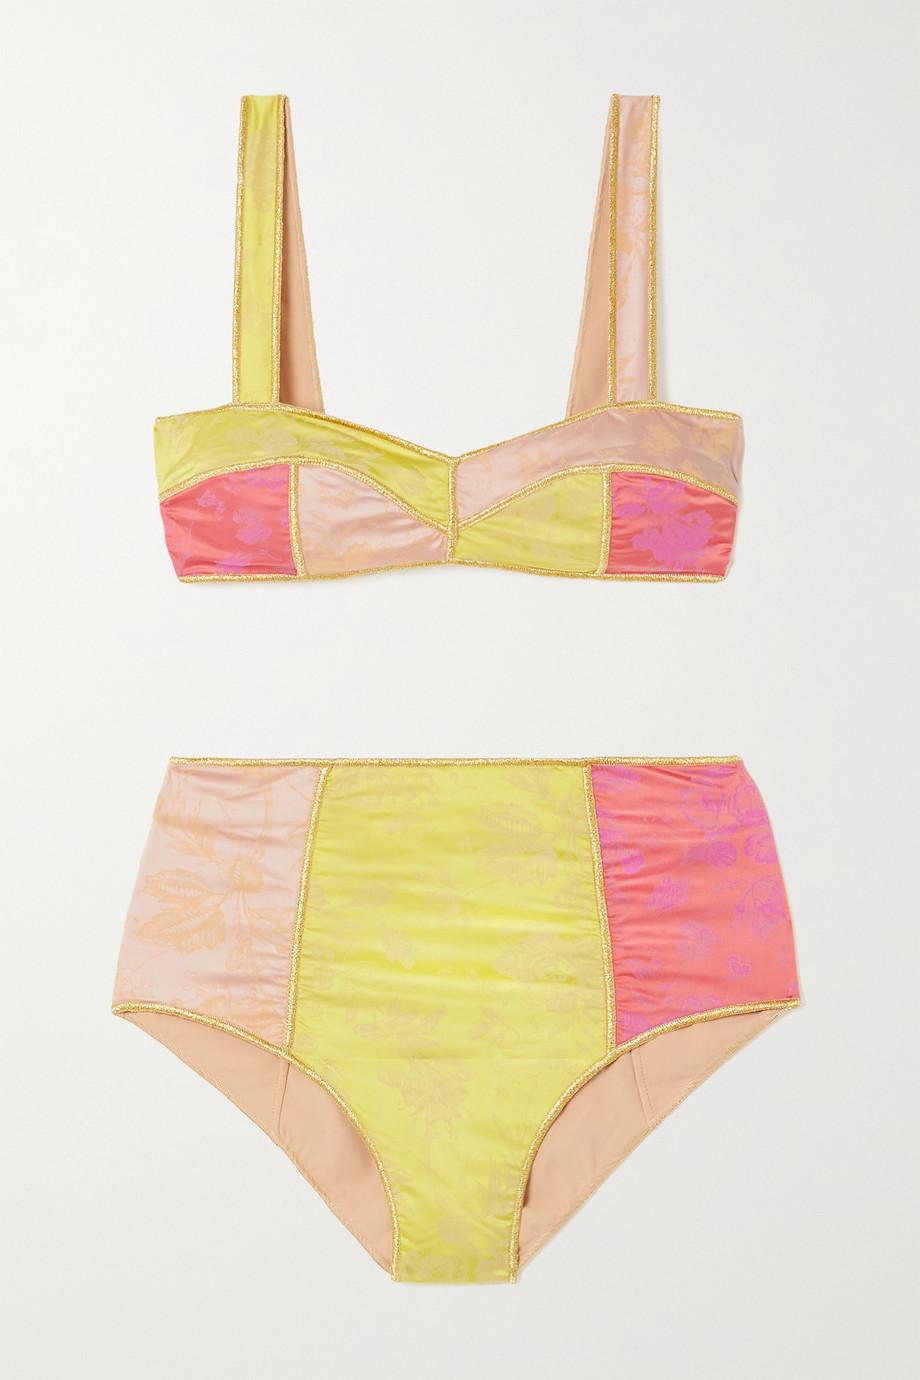 Oséree Blossom Colorè floral-jacquard bikini